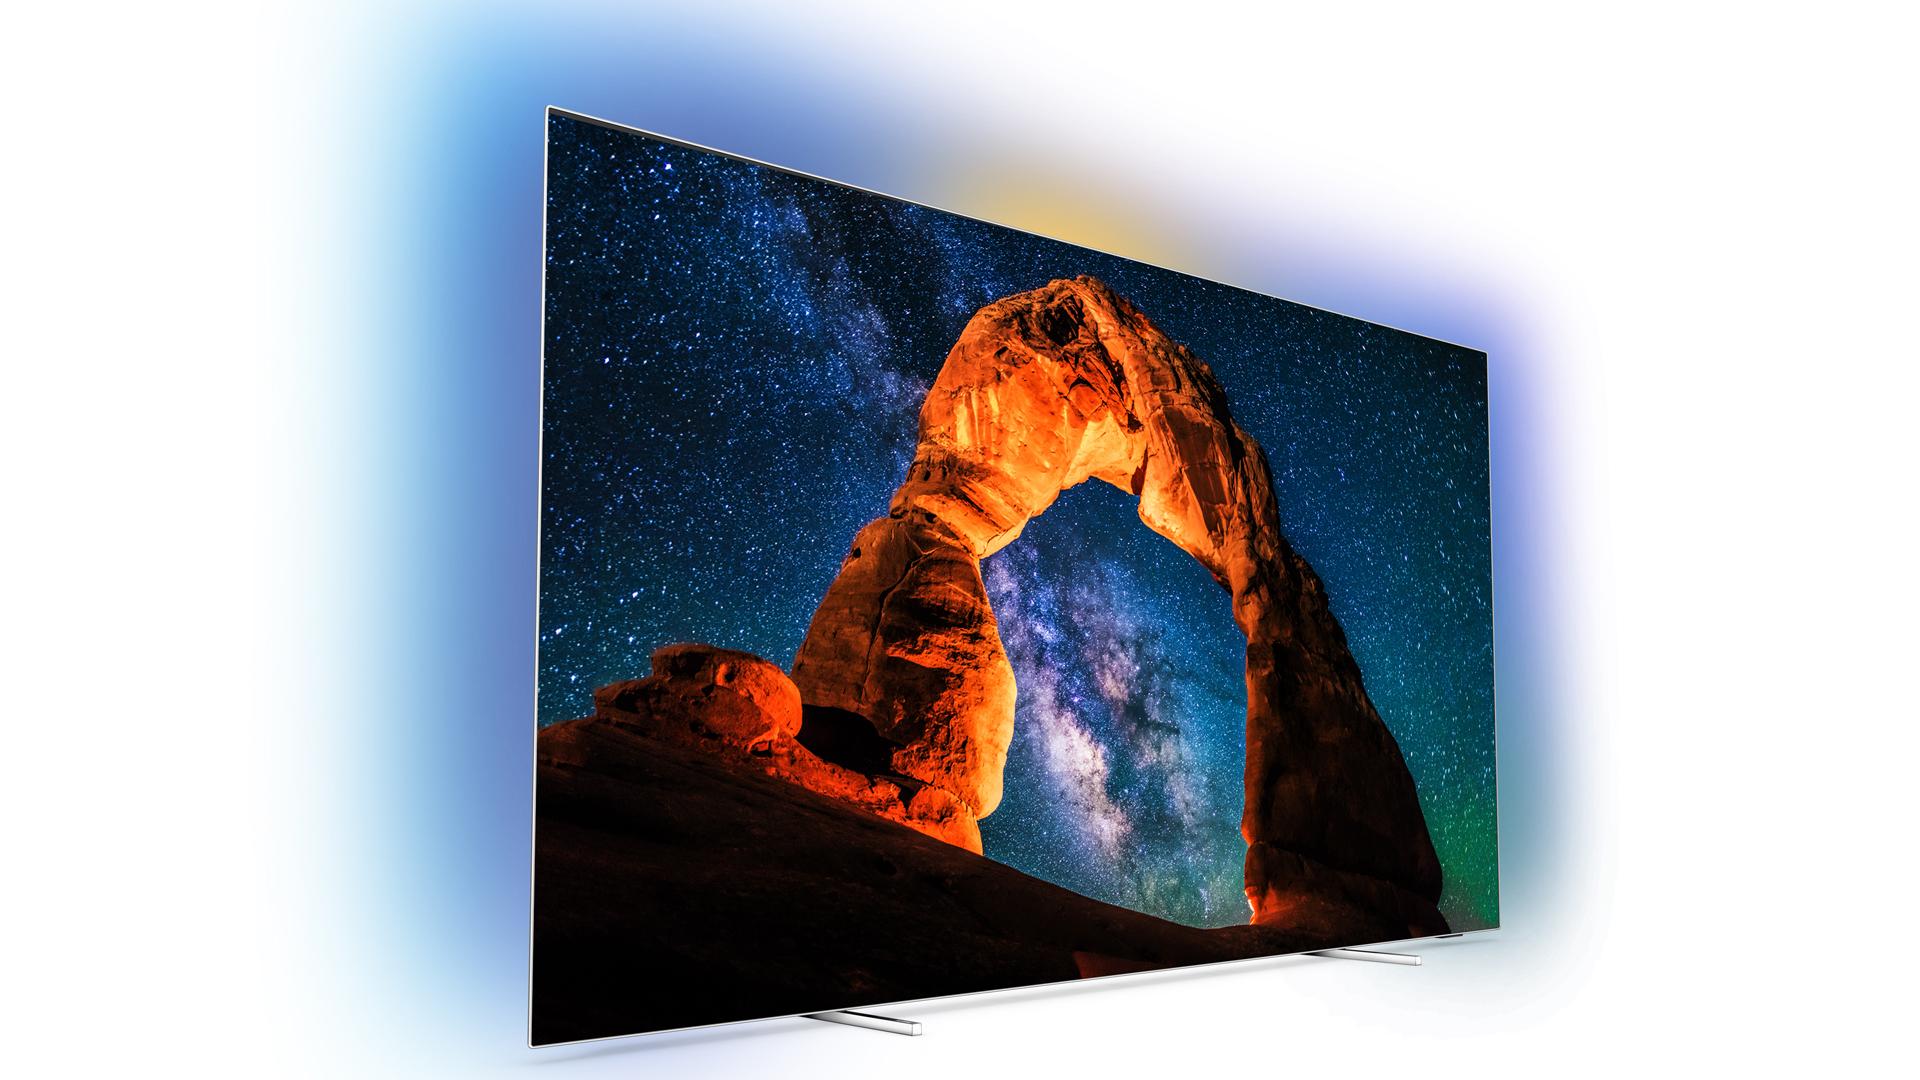 Philips OLED 803 4K HDR TV (55OLED803) review   TechRadar